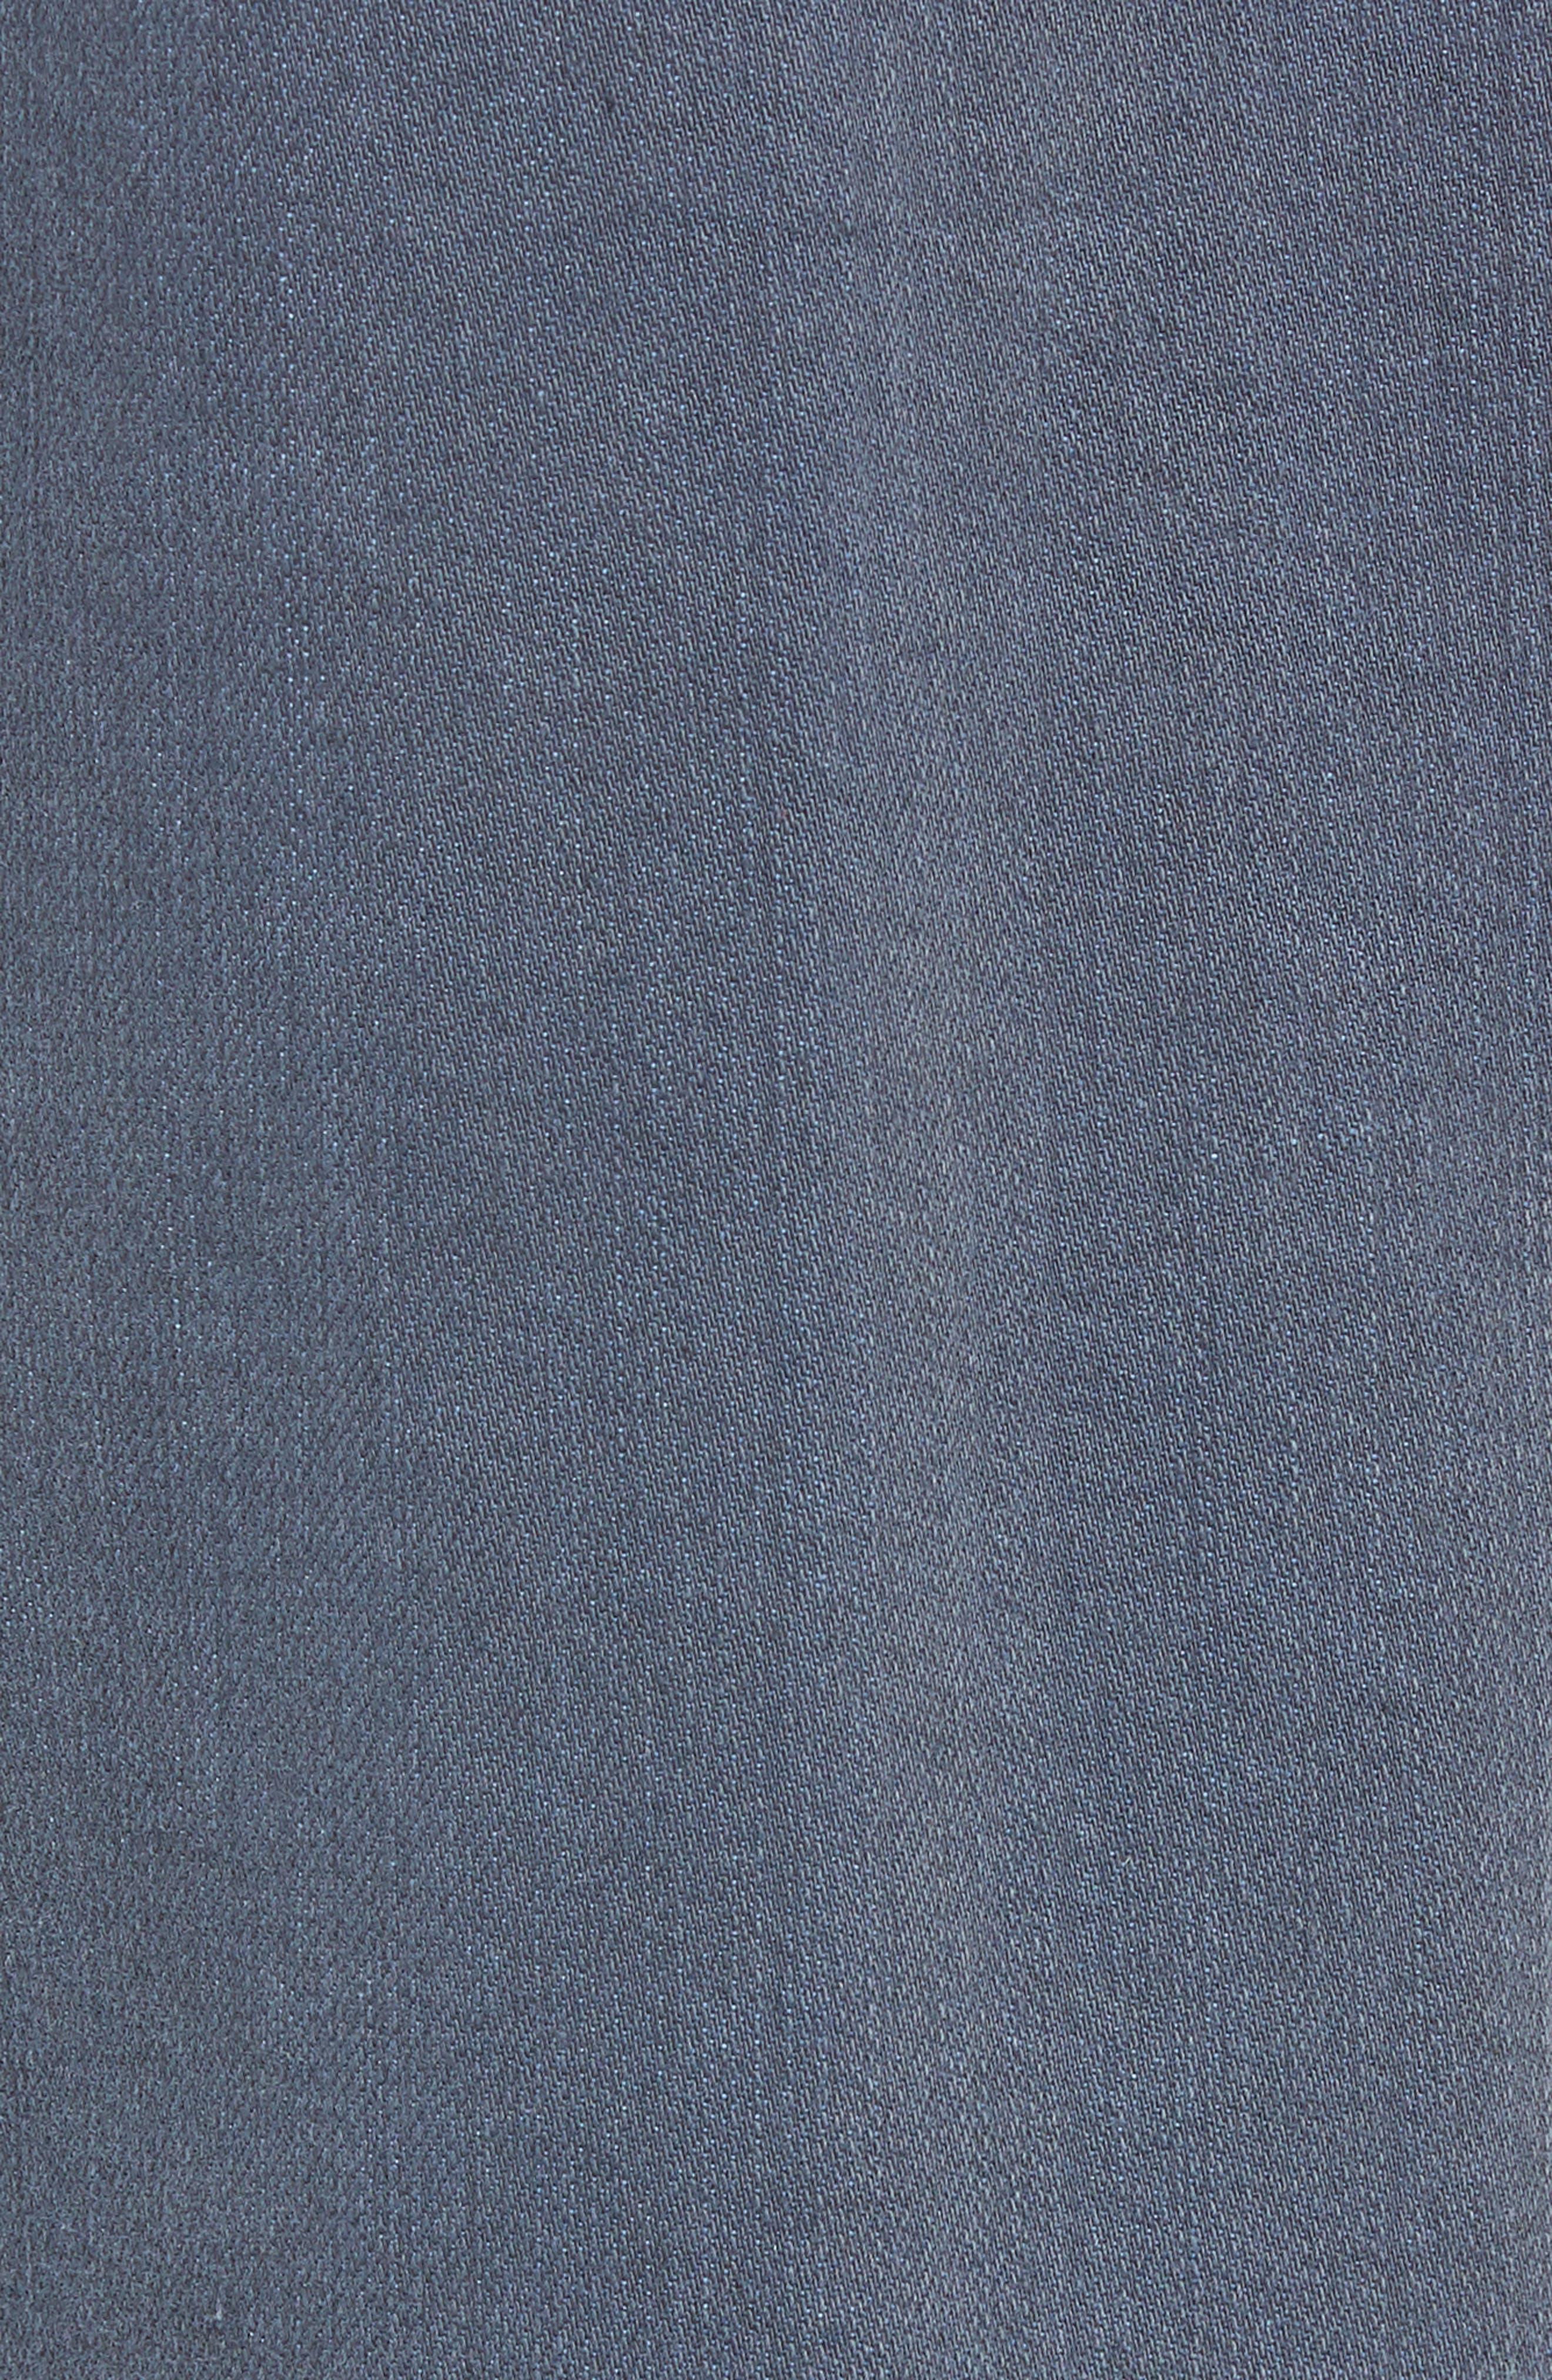 Graduate Slim Straight Leg Jeans,                             Alternate thumbnail 5, color,                             FLUXING TIDES